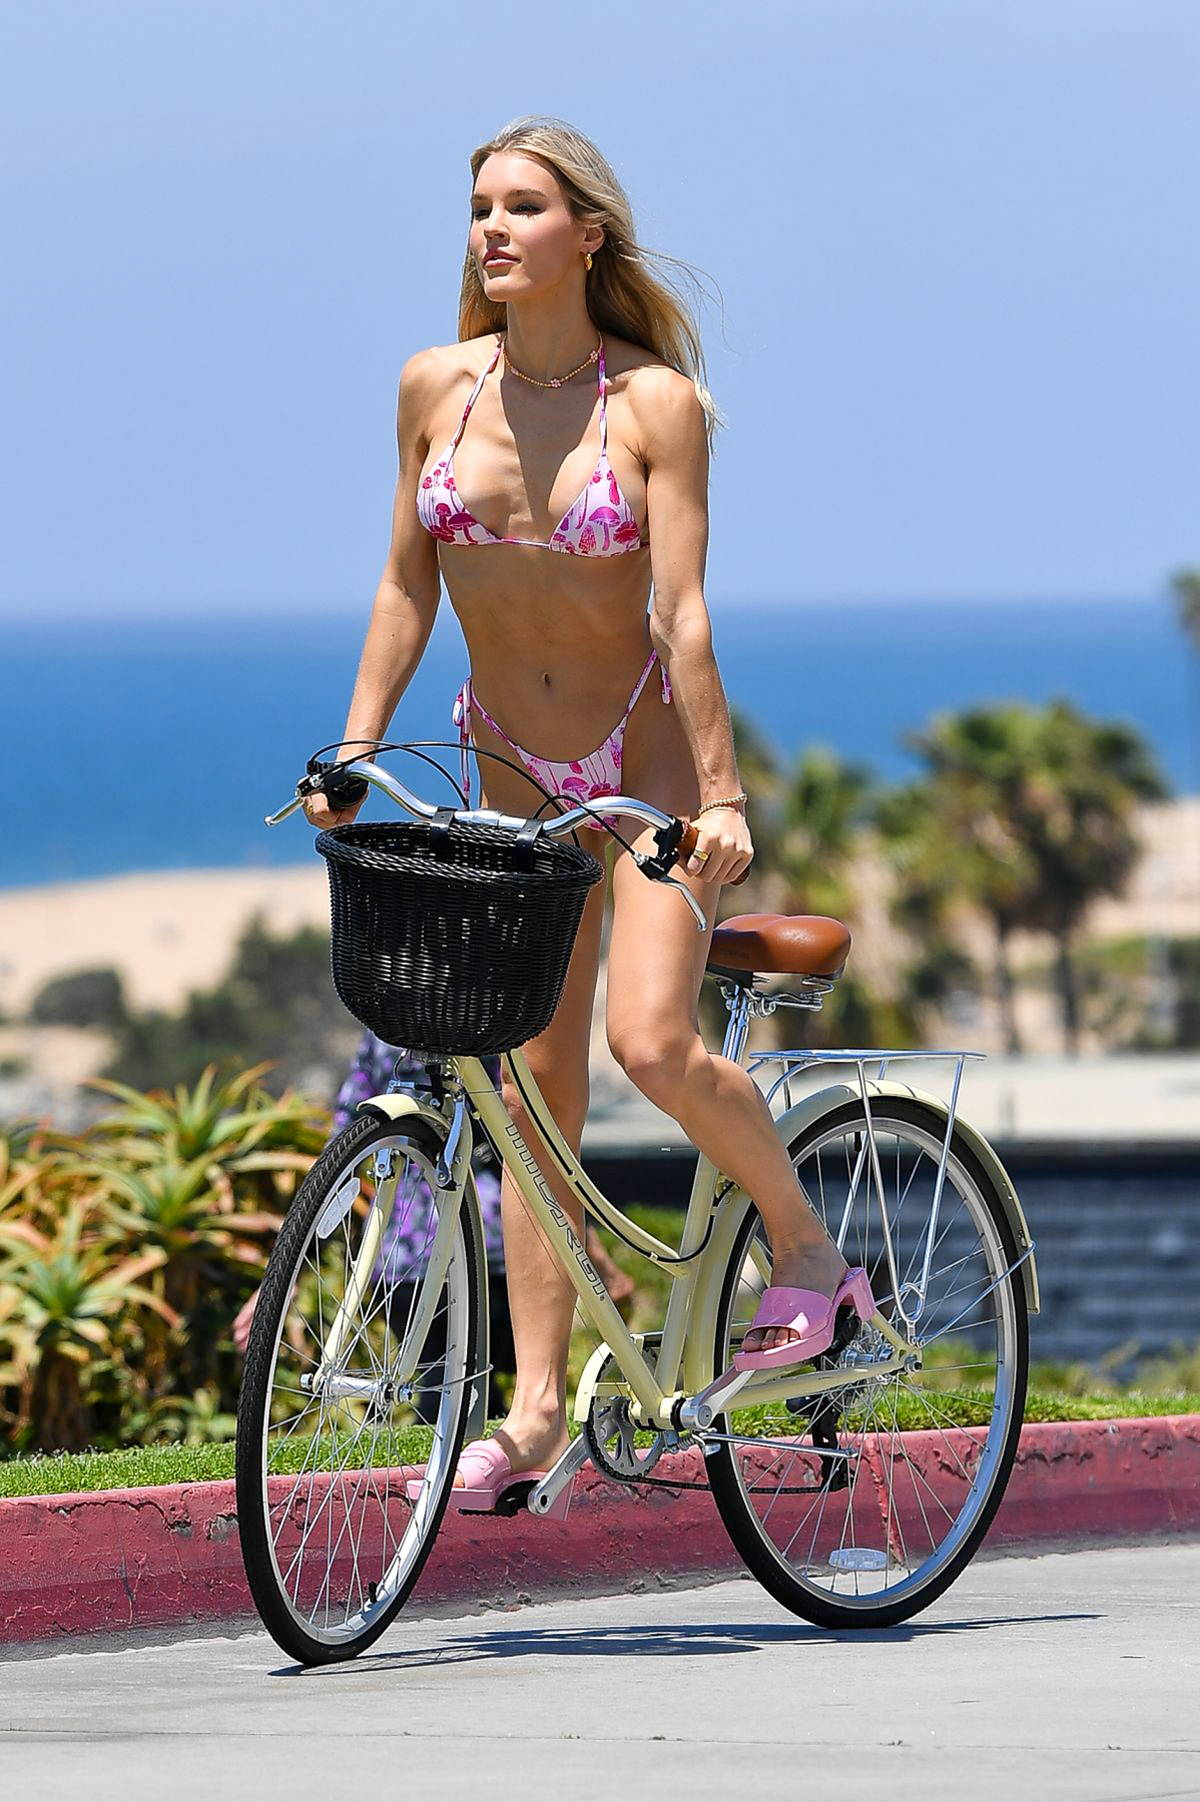 Joy Corrigan stuns in a mushroom print pink bikini while enjoying a bike ride along the beach in Los Angeles